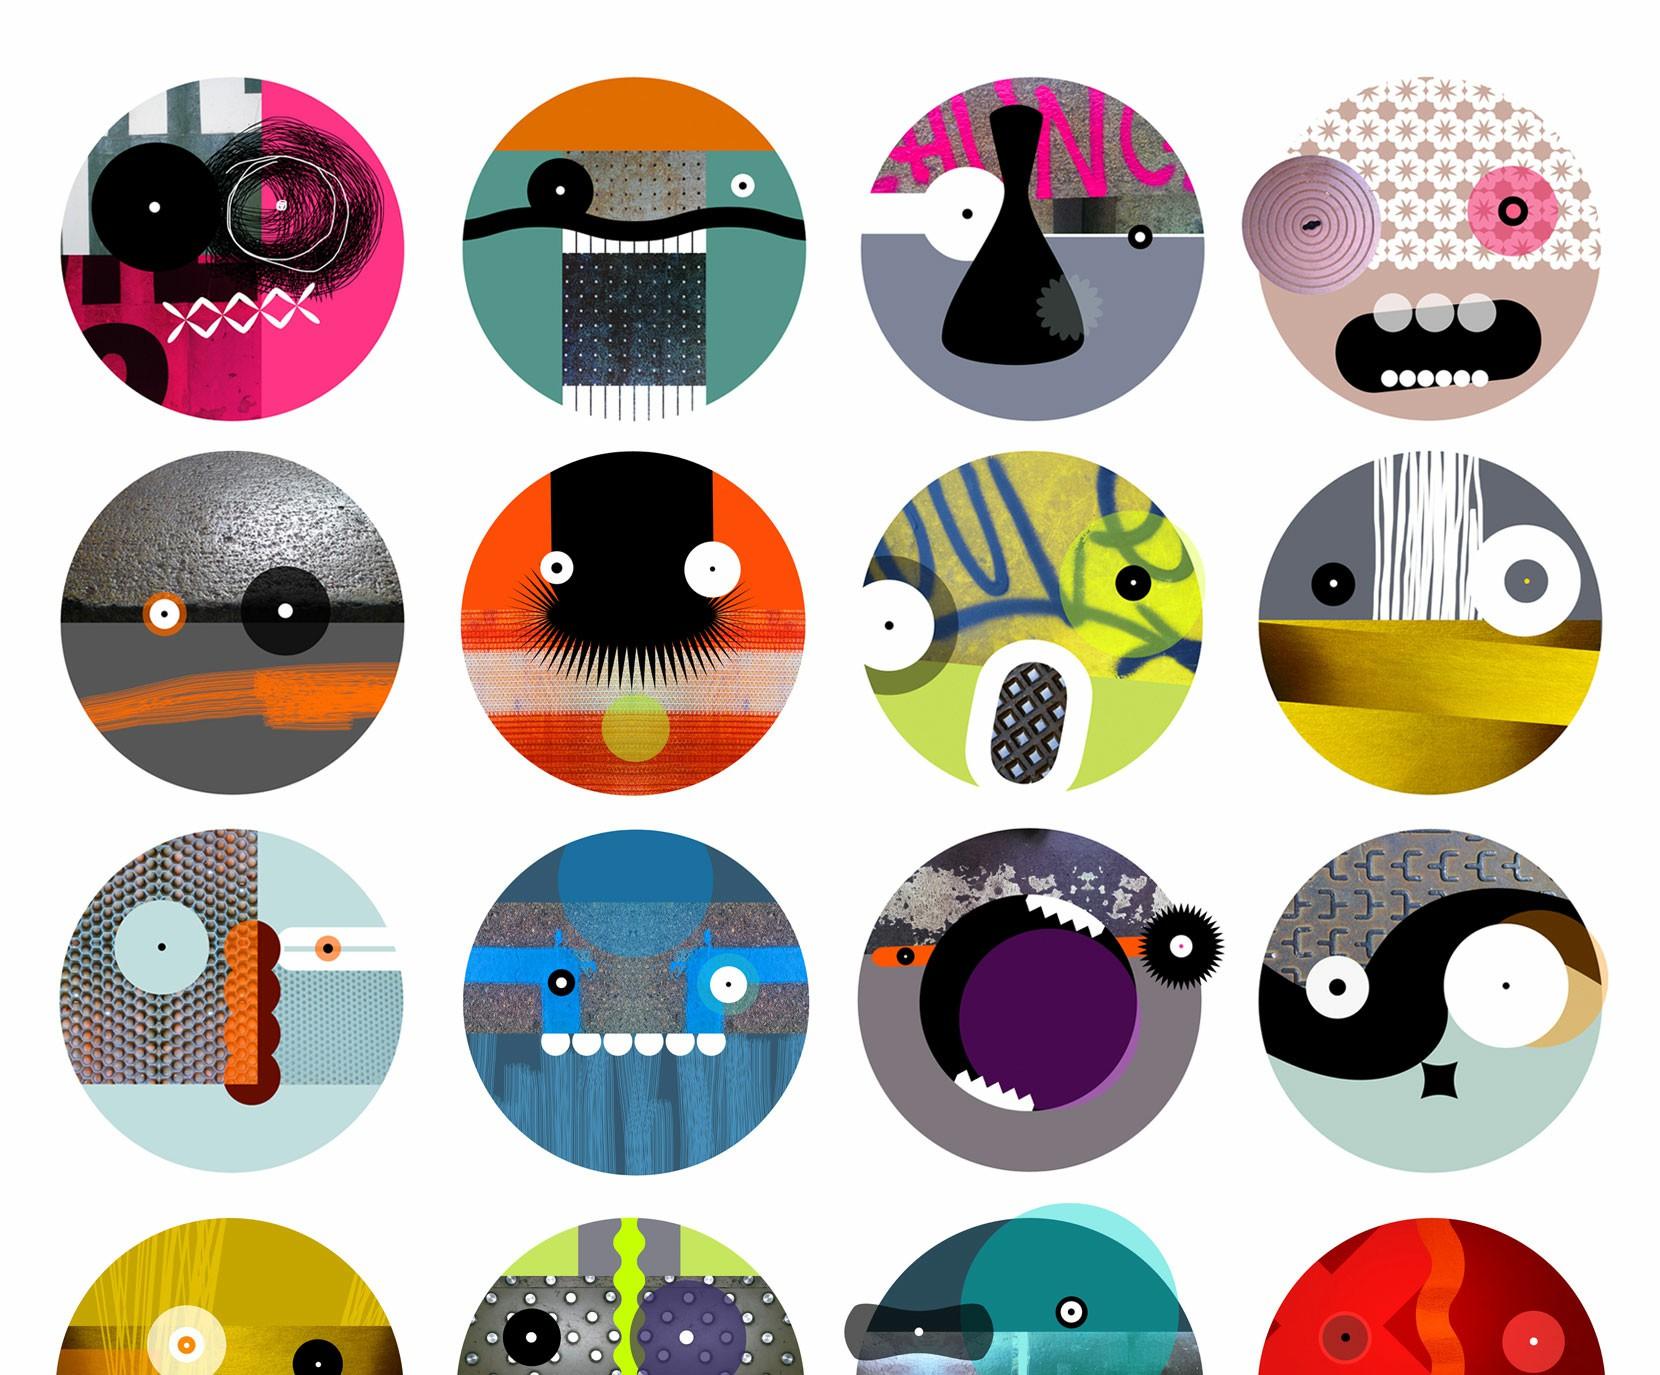 Crisis-Emoticons-concept-and-idea-from-Silvio-Cocco